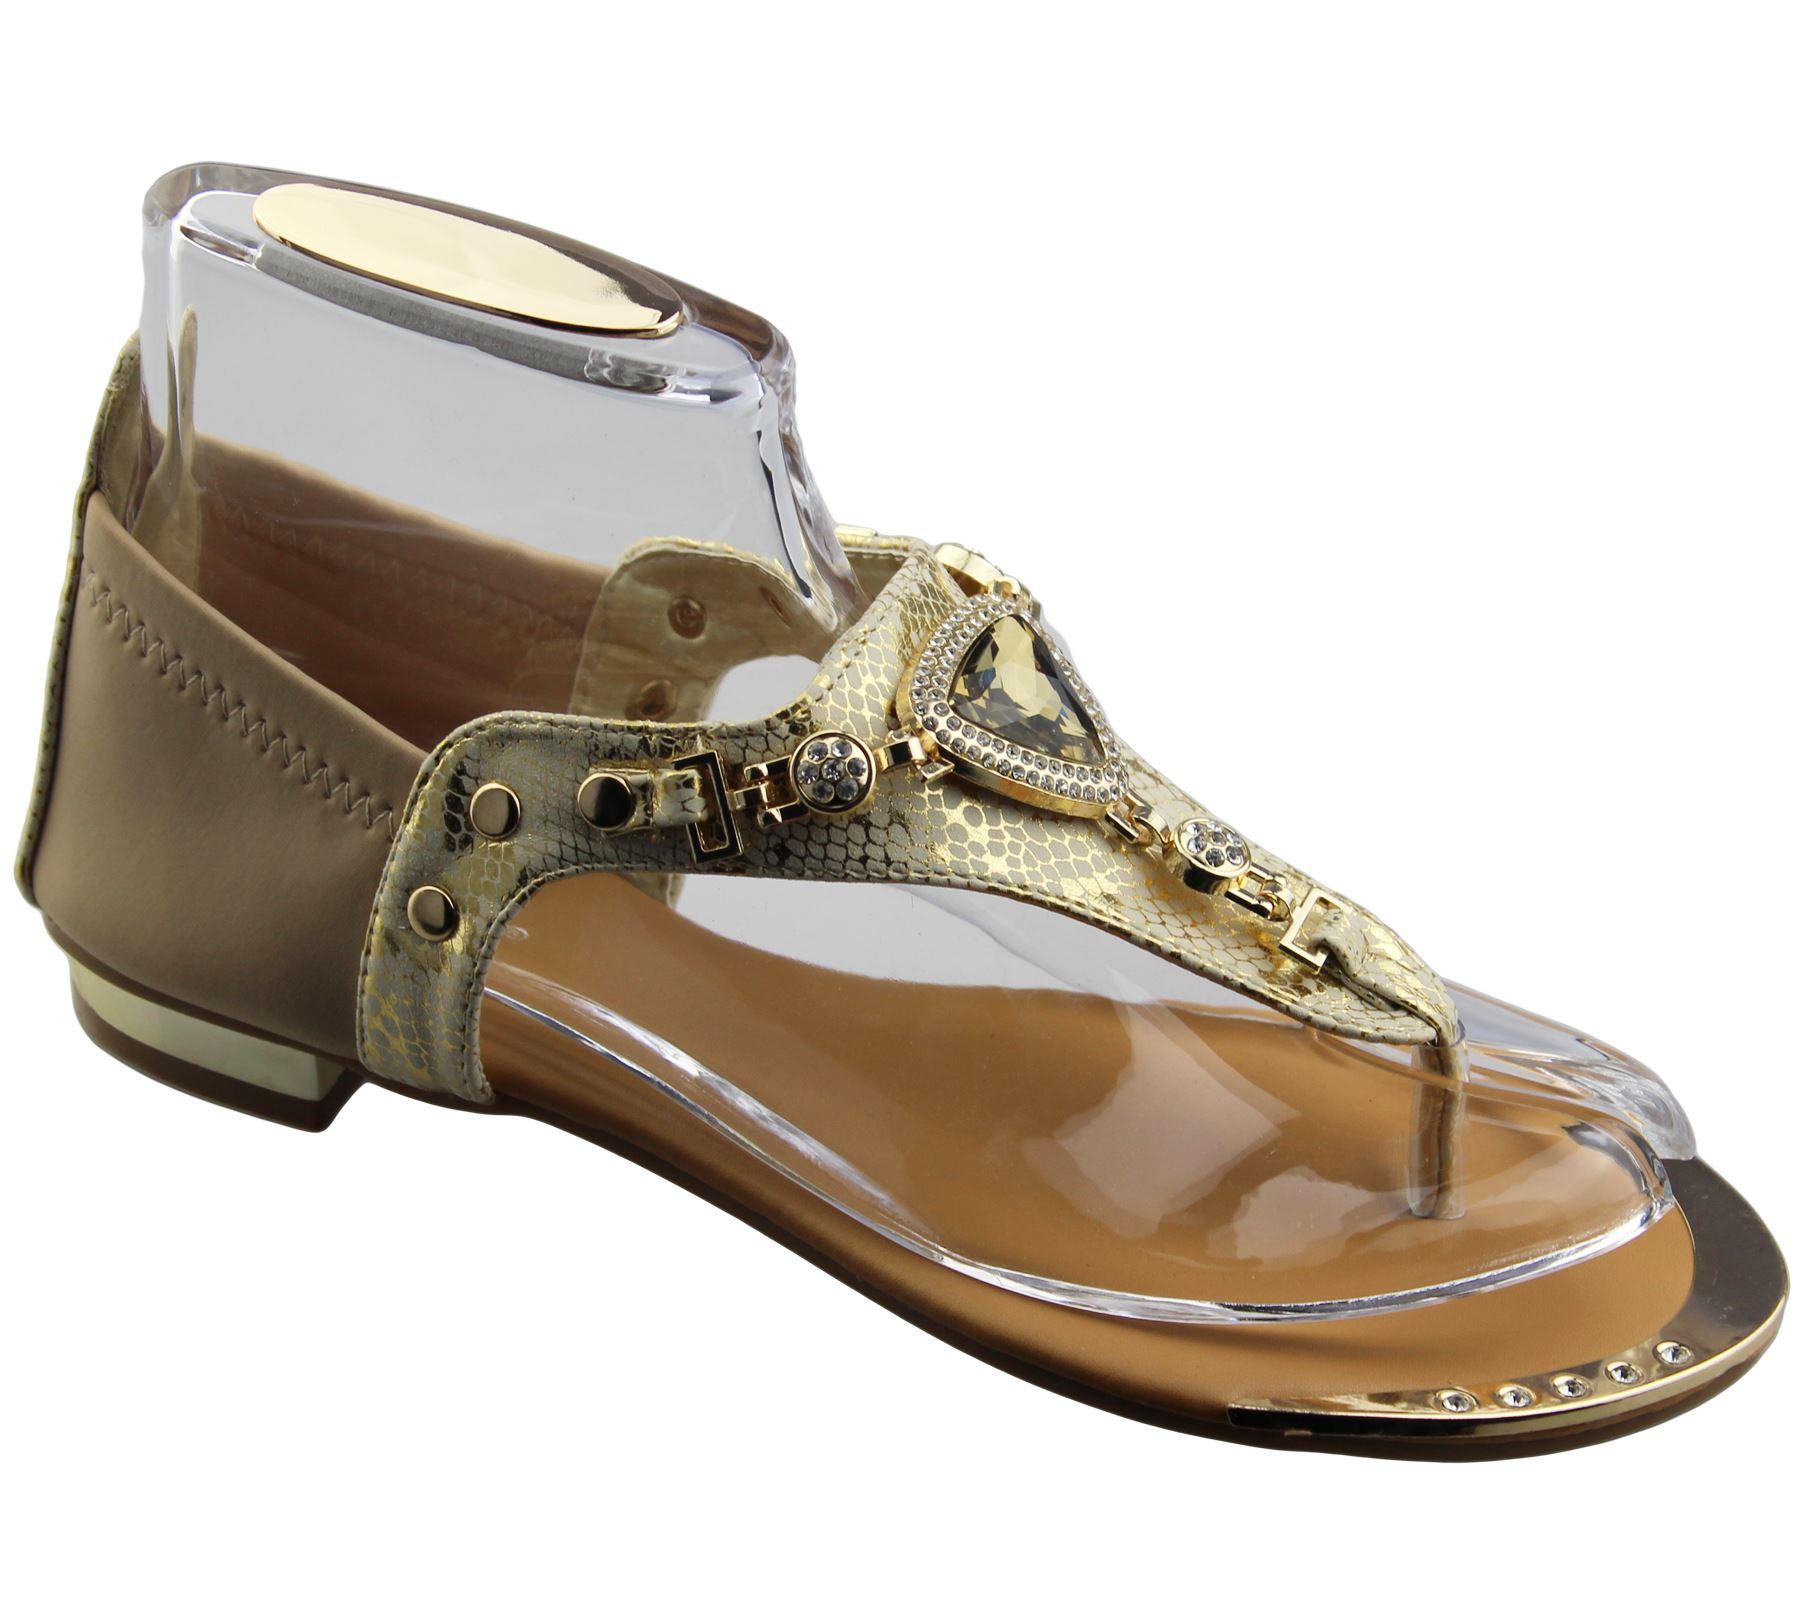 Womens-Flat-Summer-Sandals-Ladies-Diamante-Wedding-Toe-Post-Casual-Slipper thumbnail 18